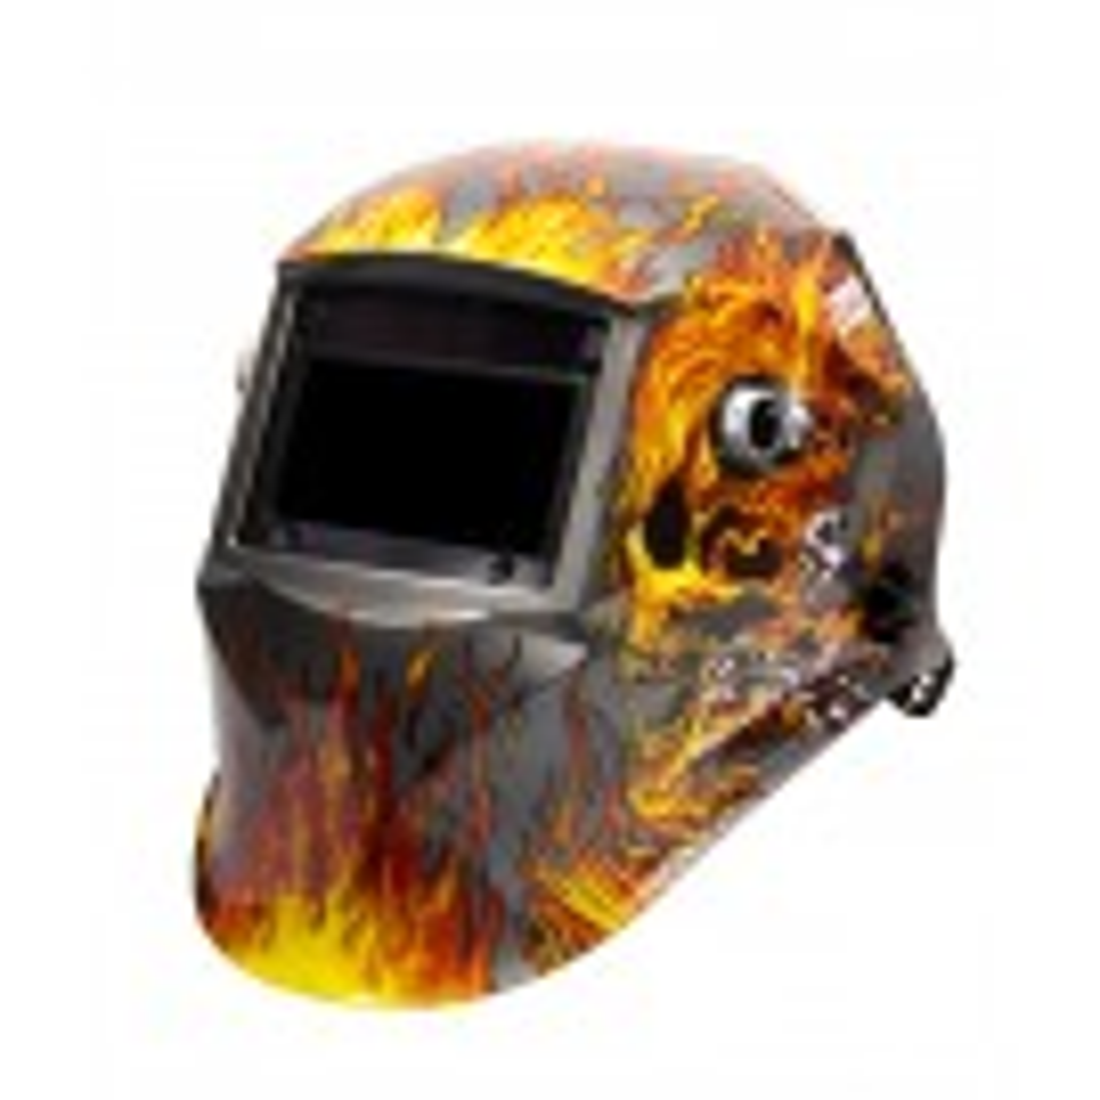 Automatic welding helmet, 'FLAME' design